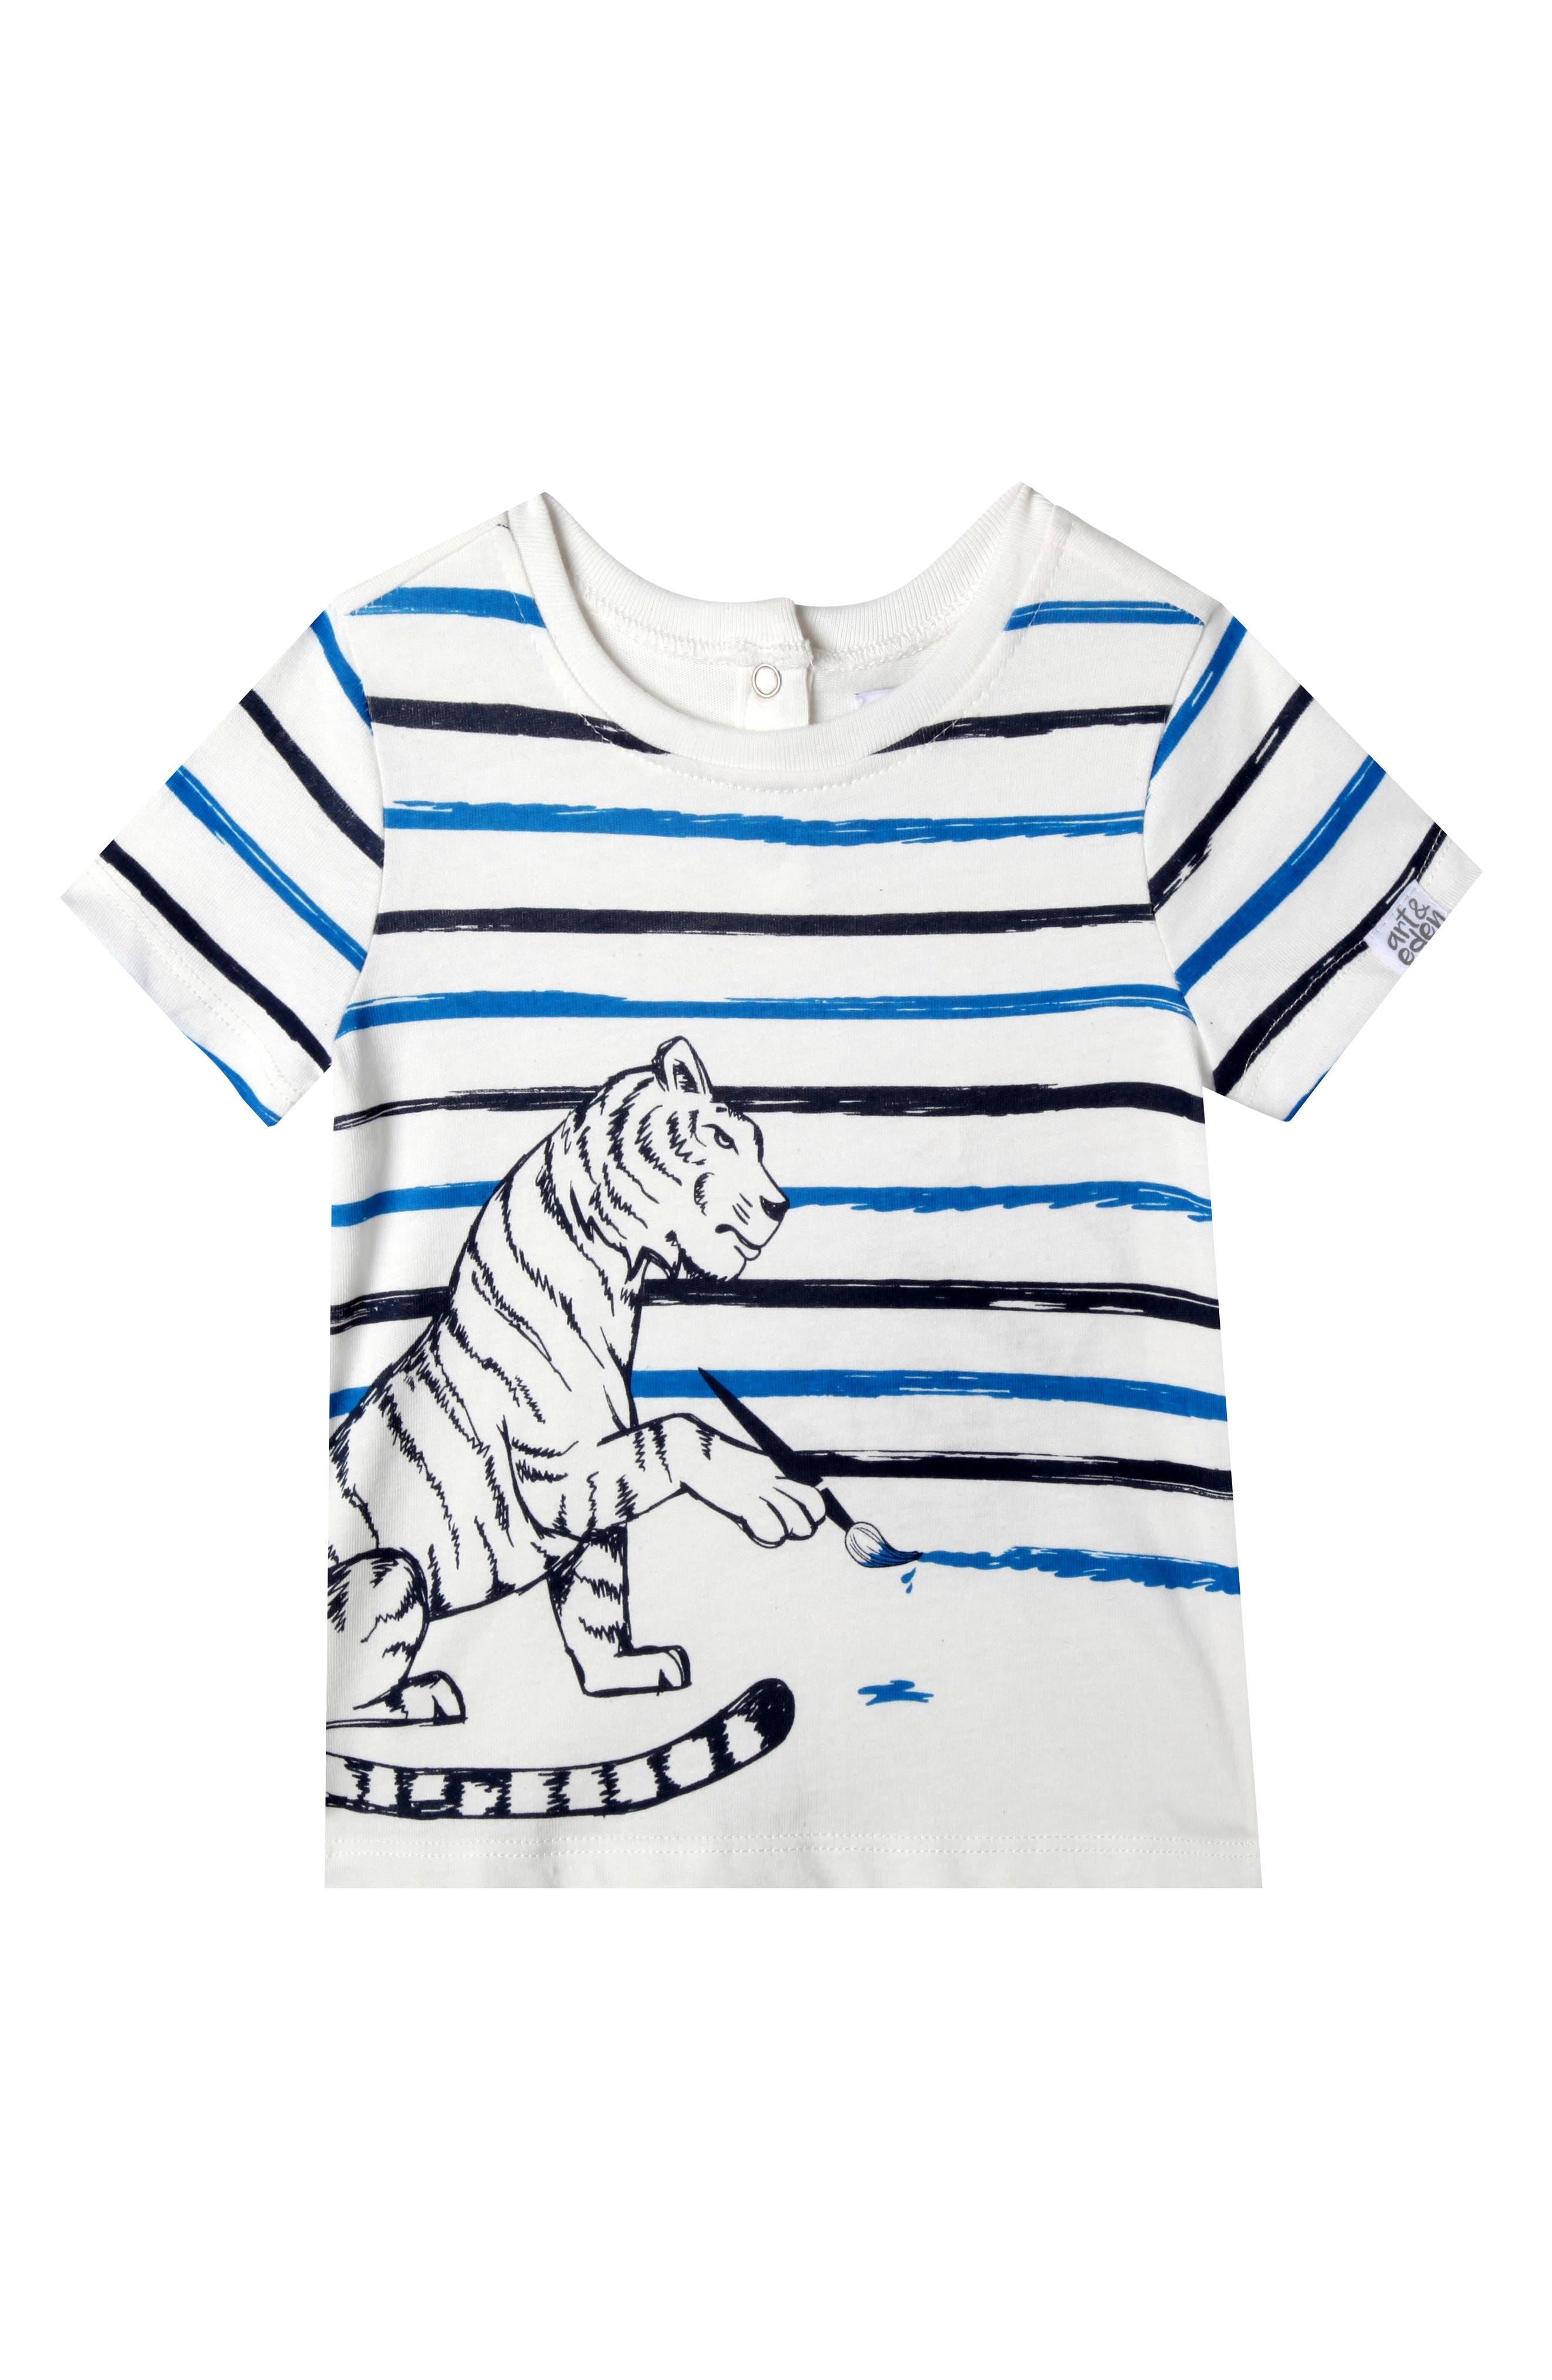 ART & EDEN Caleb T-Shirt, Main, color, 900